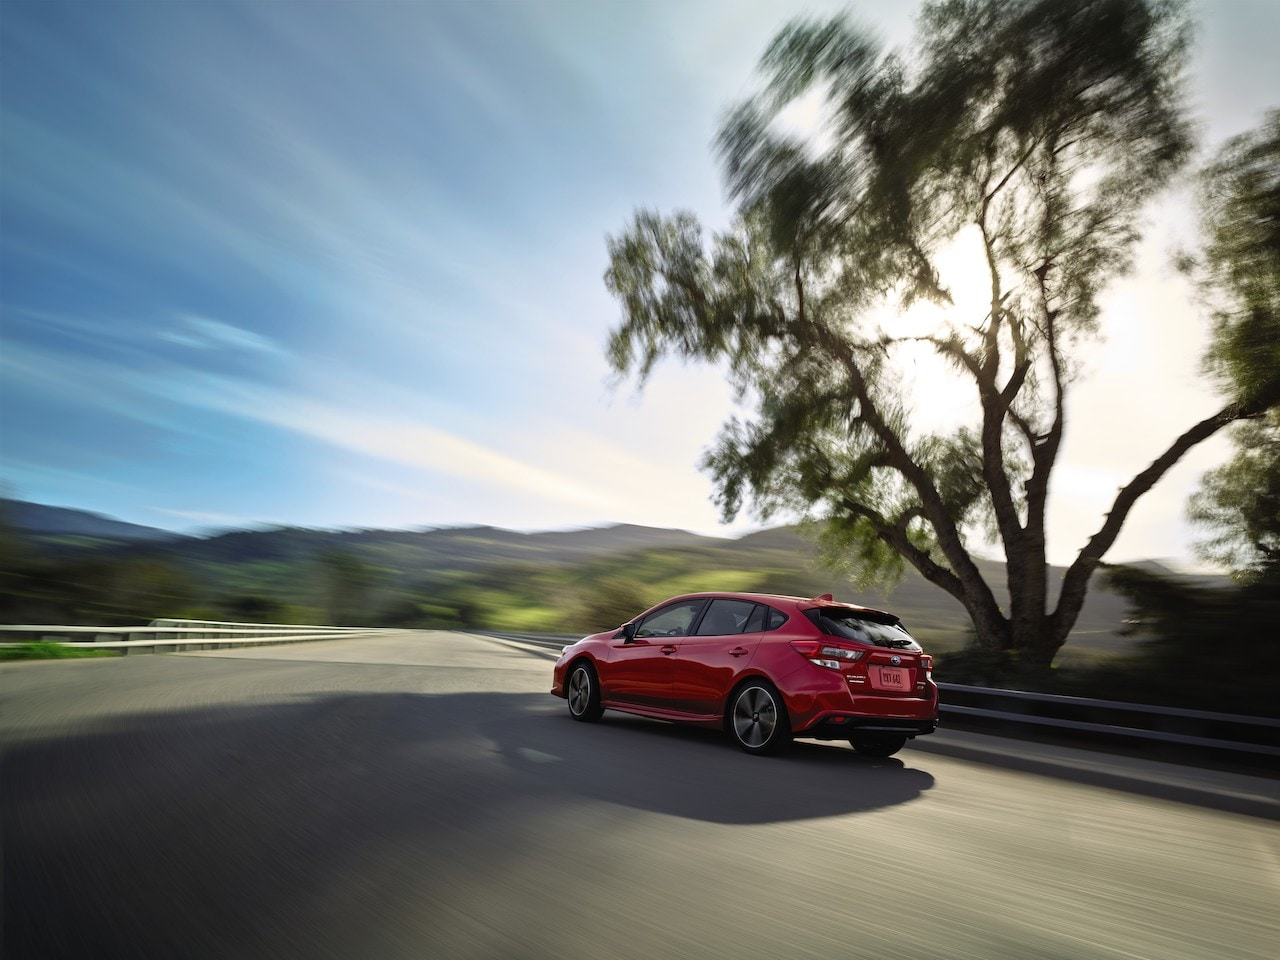 2020 Impreza 5-Door Red rear at speed